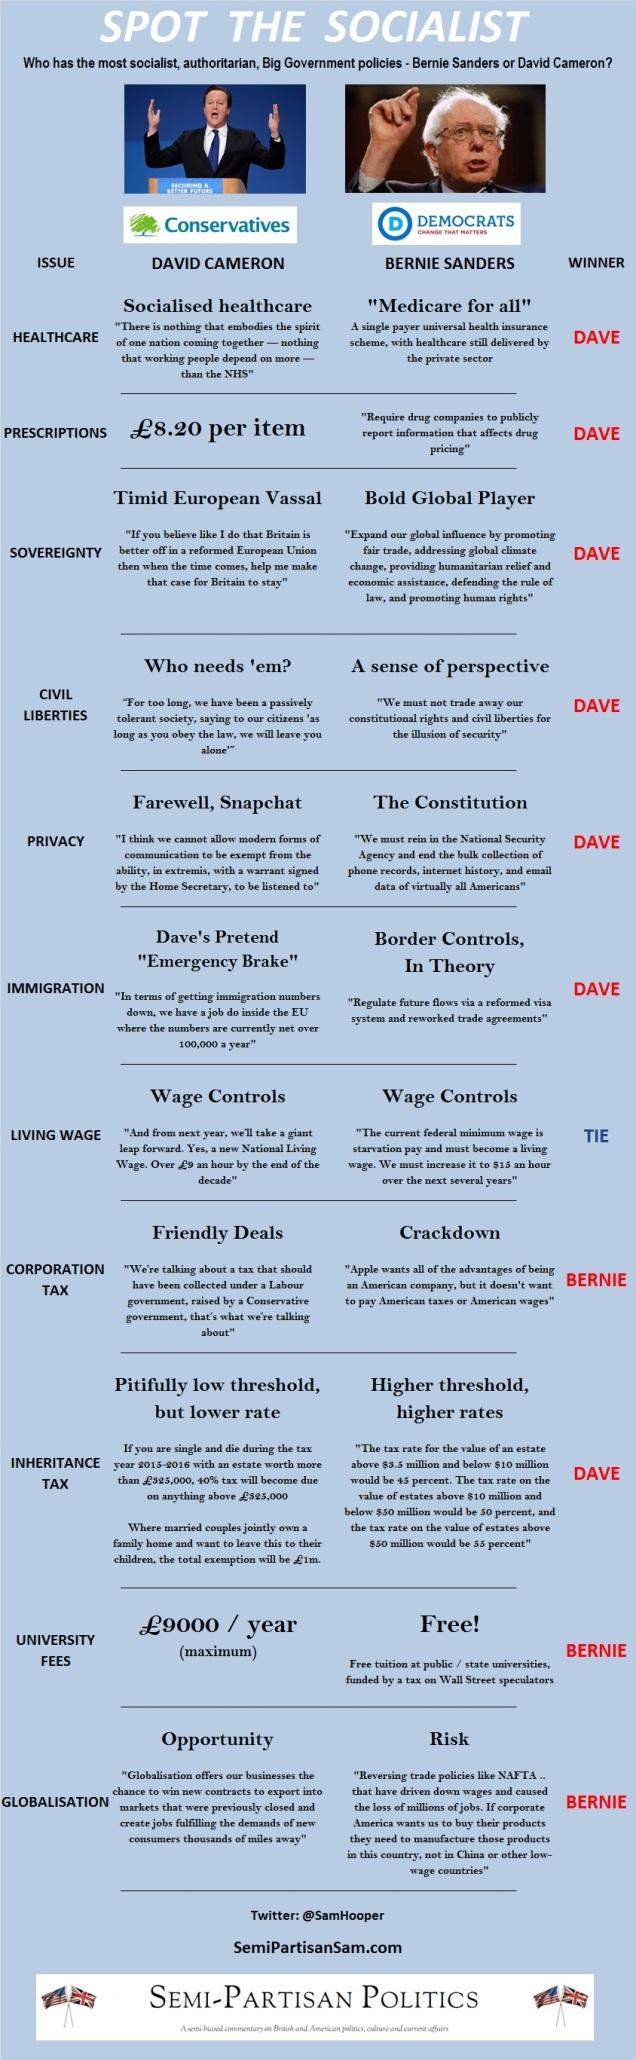 Spot The Socialist - David Cameron vs Bernie Sanders - Semi Partisan Politics - Sam Hooper